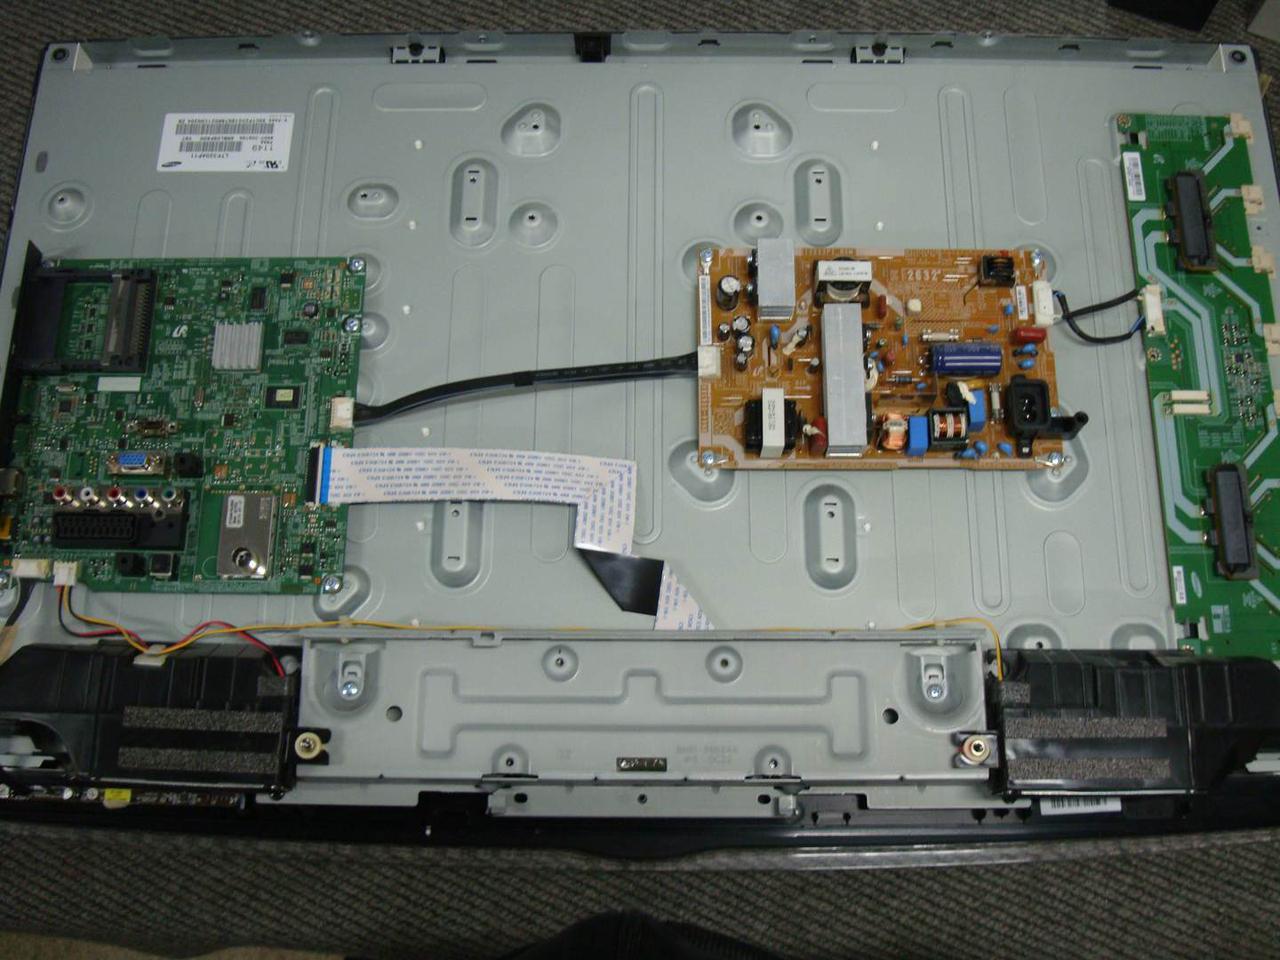 Запчасти к телевизору Samsung LE32D451G3W (BN44-00438A, 32AP11S4LV1.1, BN96-12469Q, SST320_4UA01, BN96-17614E)